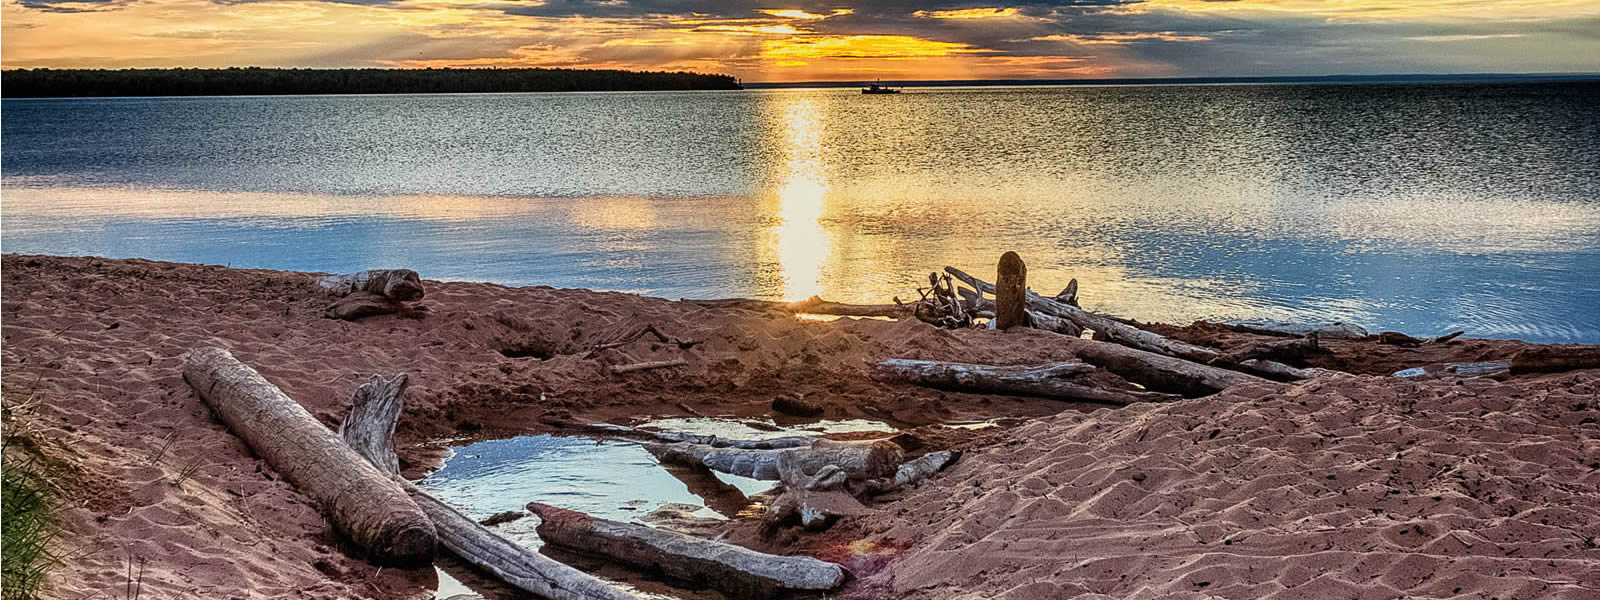 Cornucopia Sunset photo by Loyd Fisher